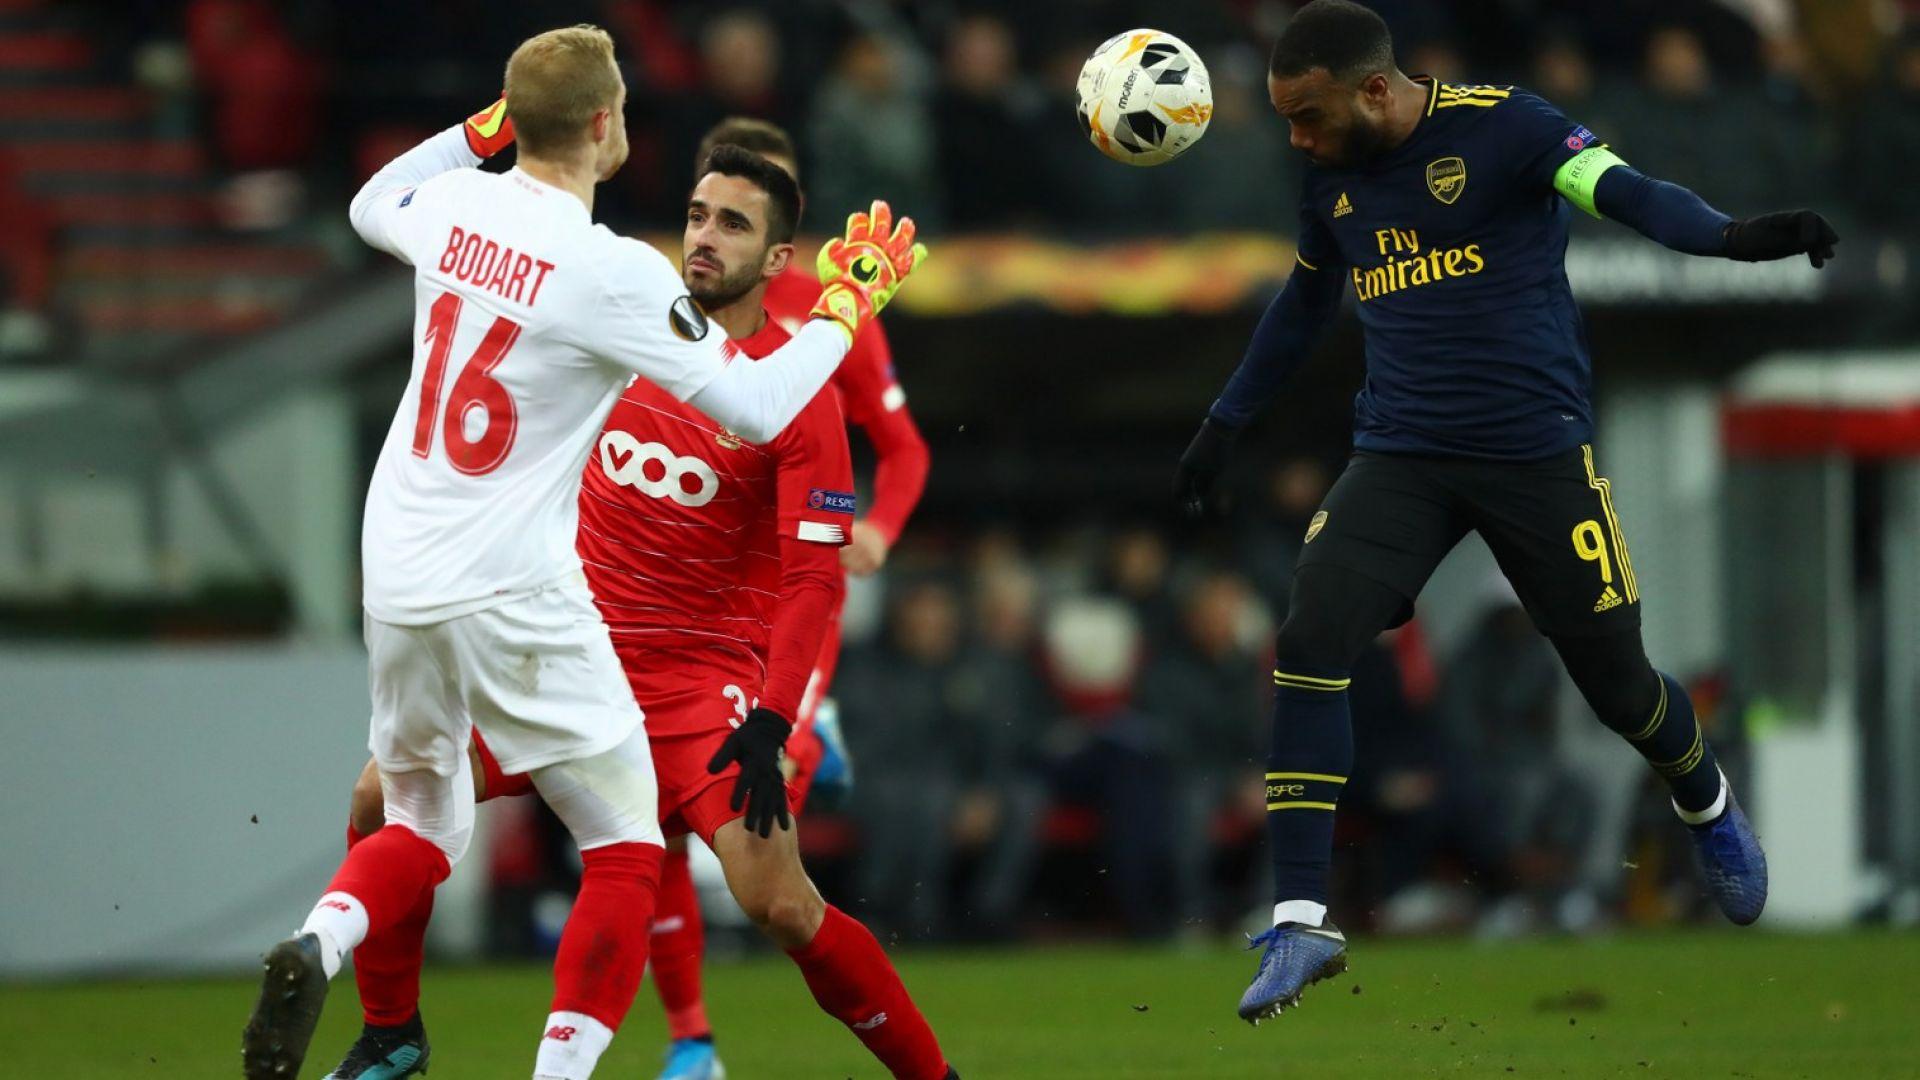 Белгийци се провалиха след 2:0 срещу Арсенал и отпаднаха (резултати)